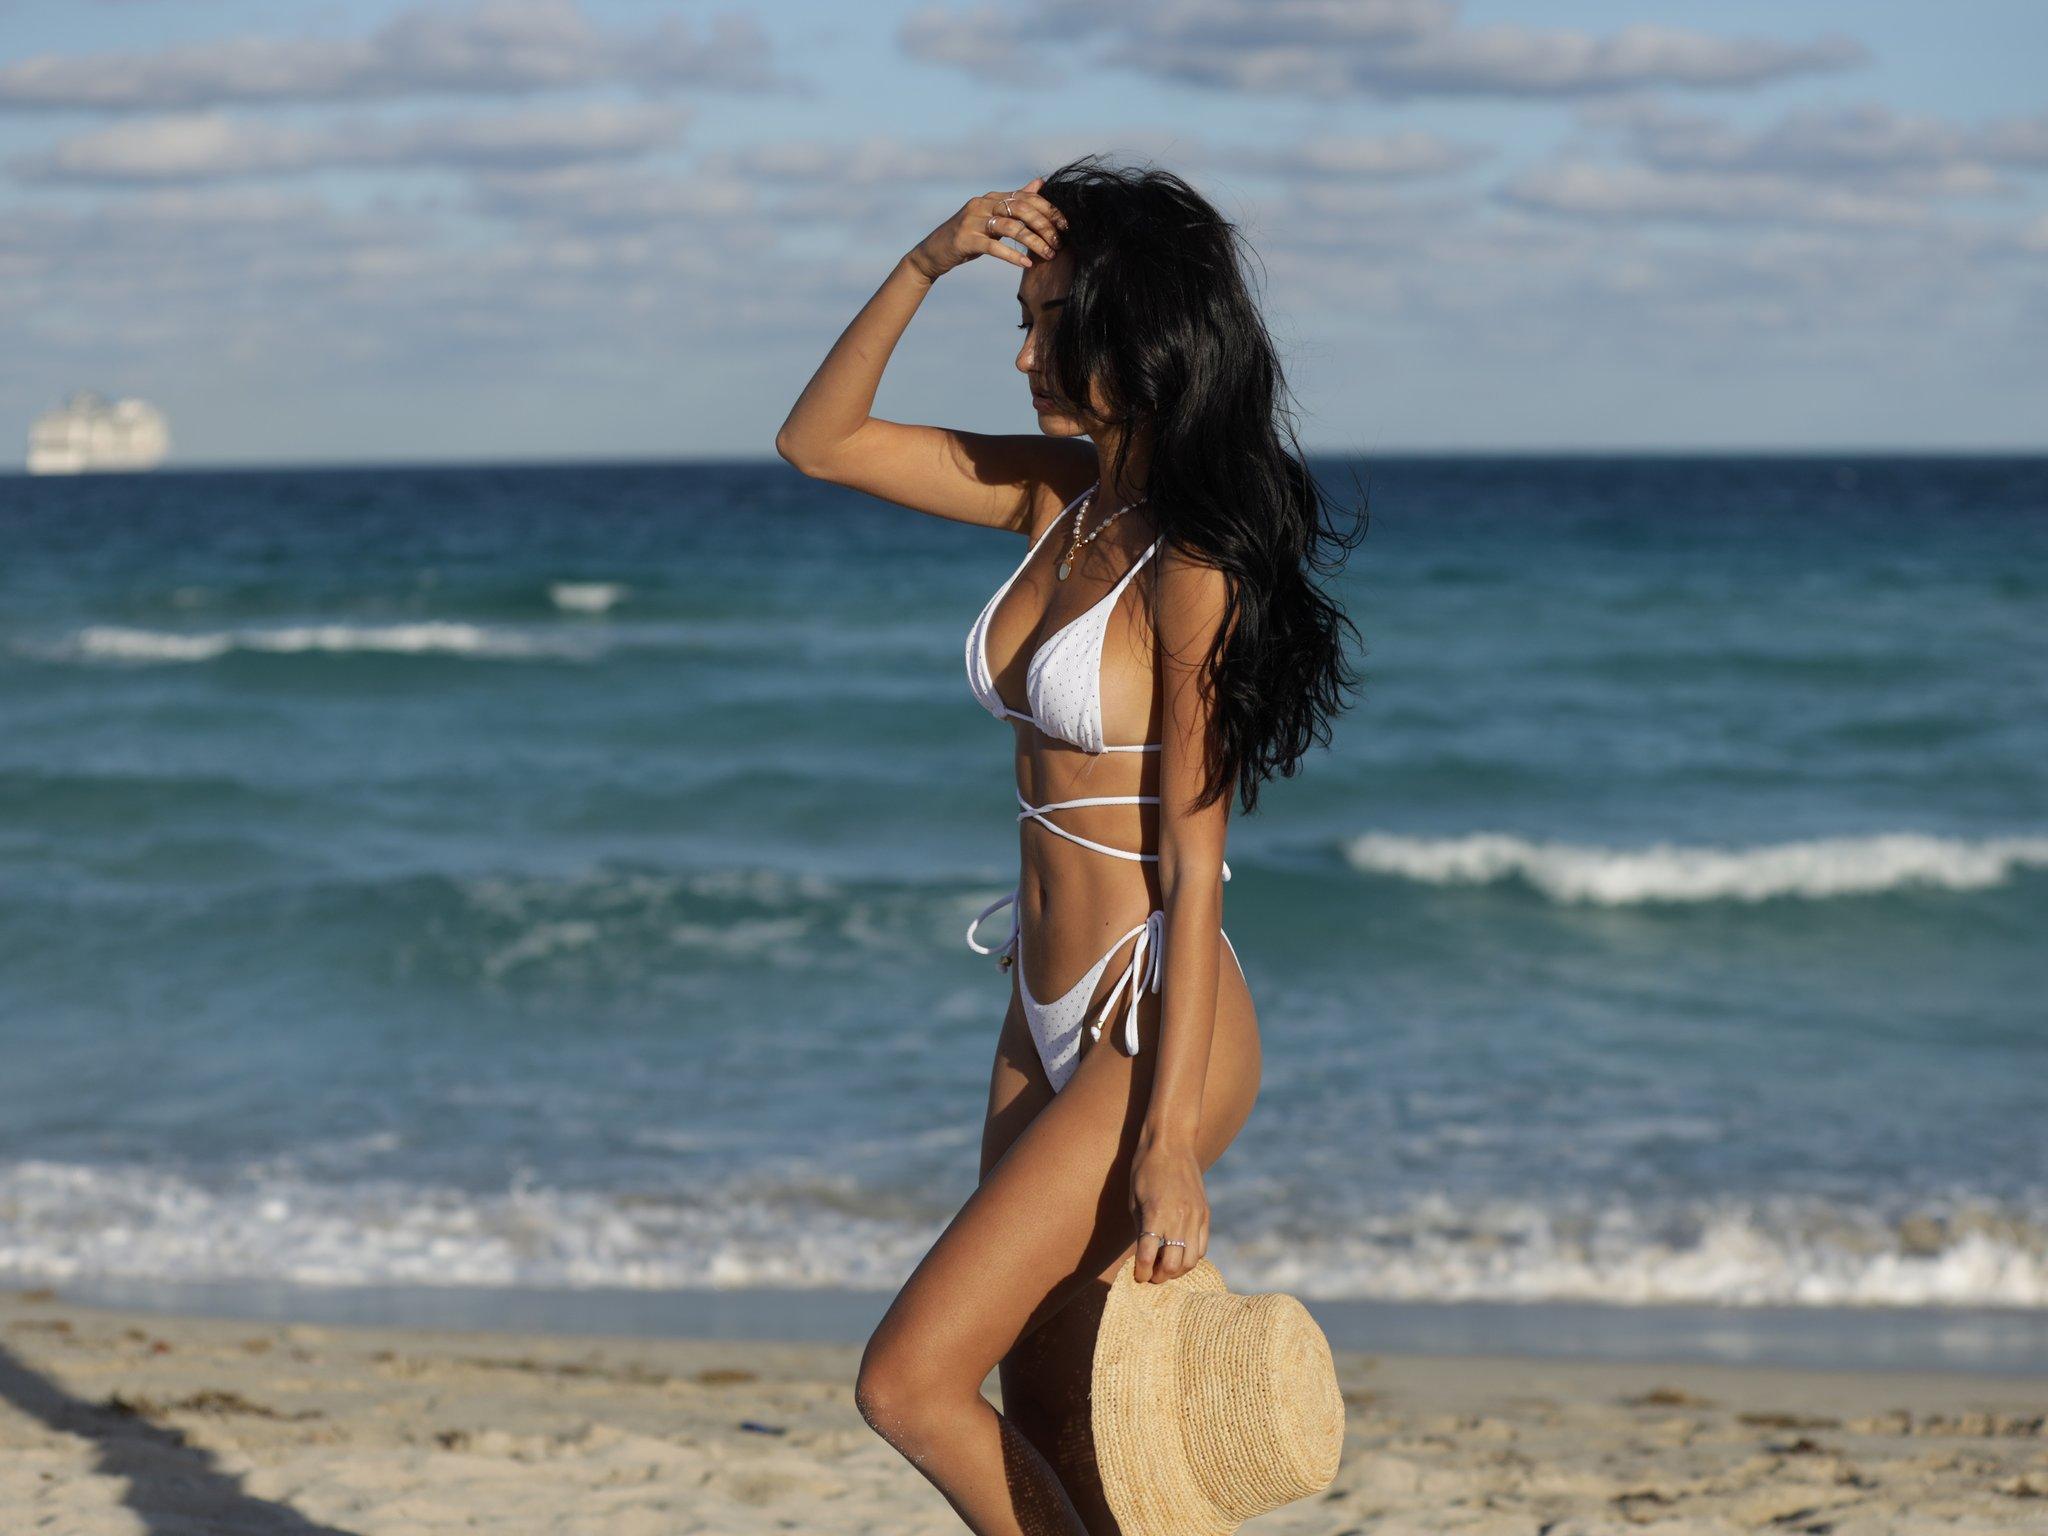 woman walking on a beach wearing a white bikini